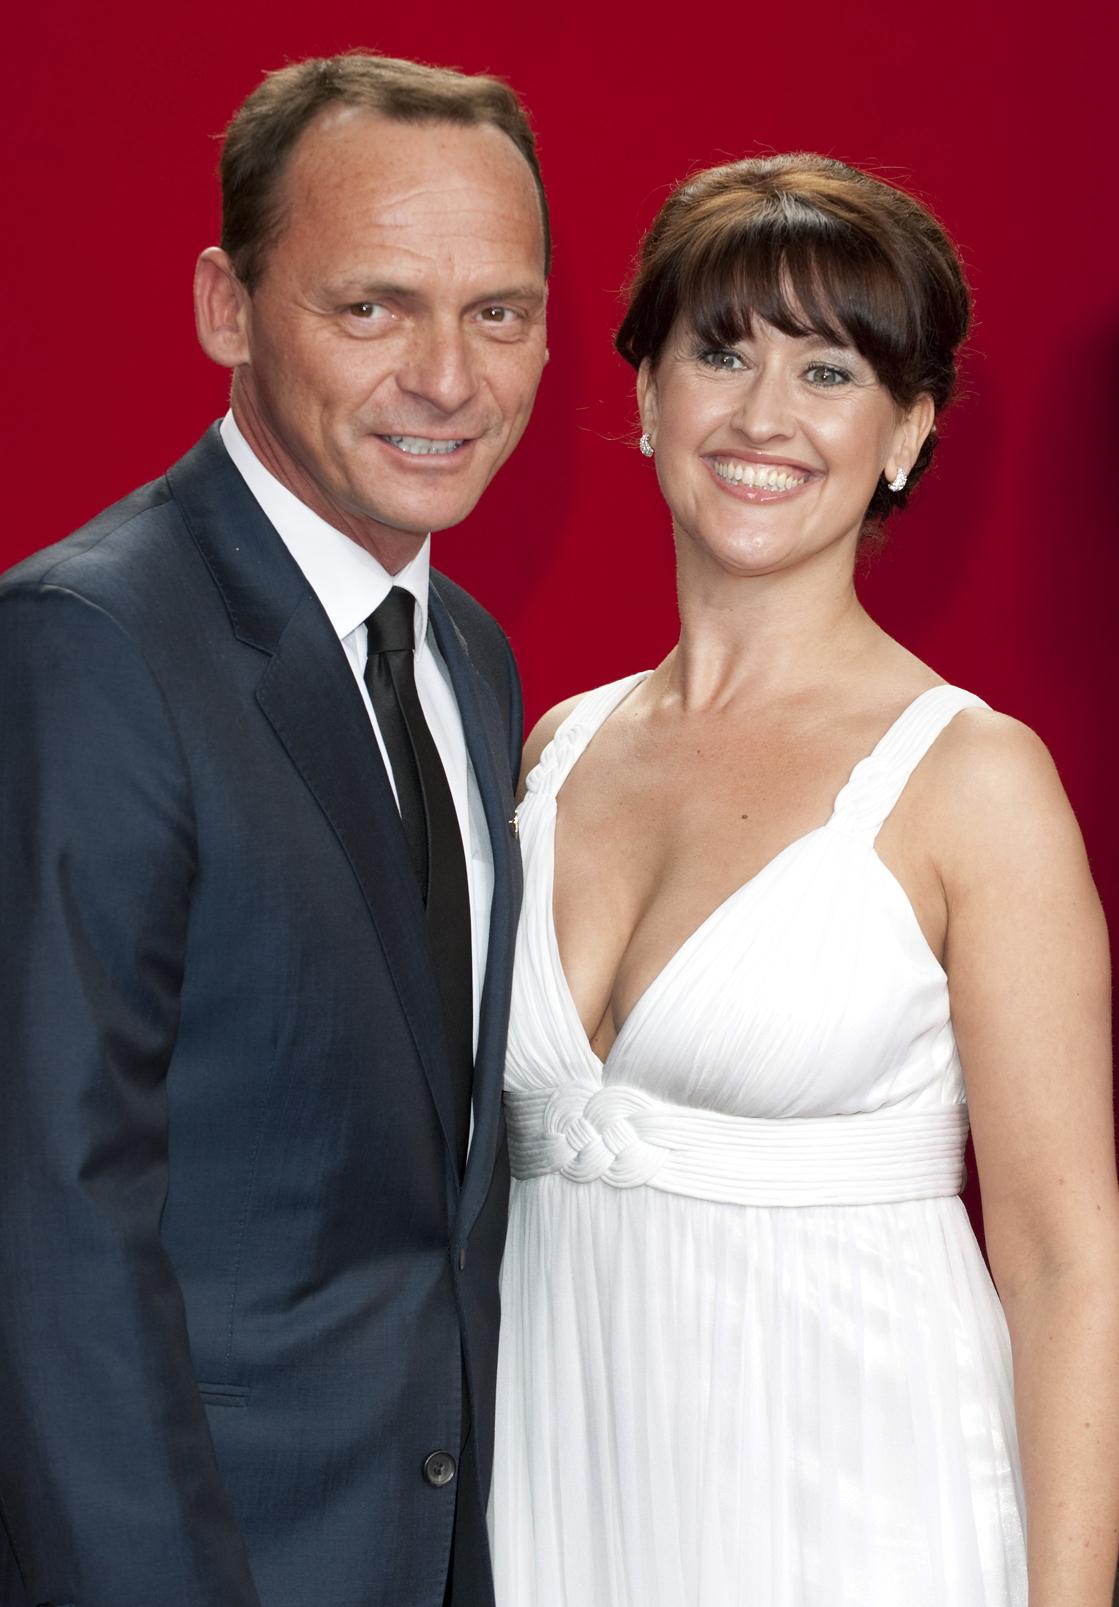 EastEnders' Perry splits from wife